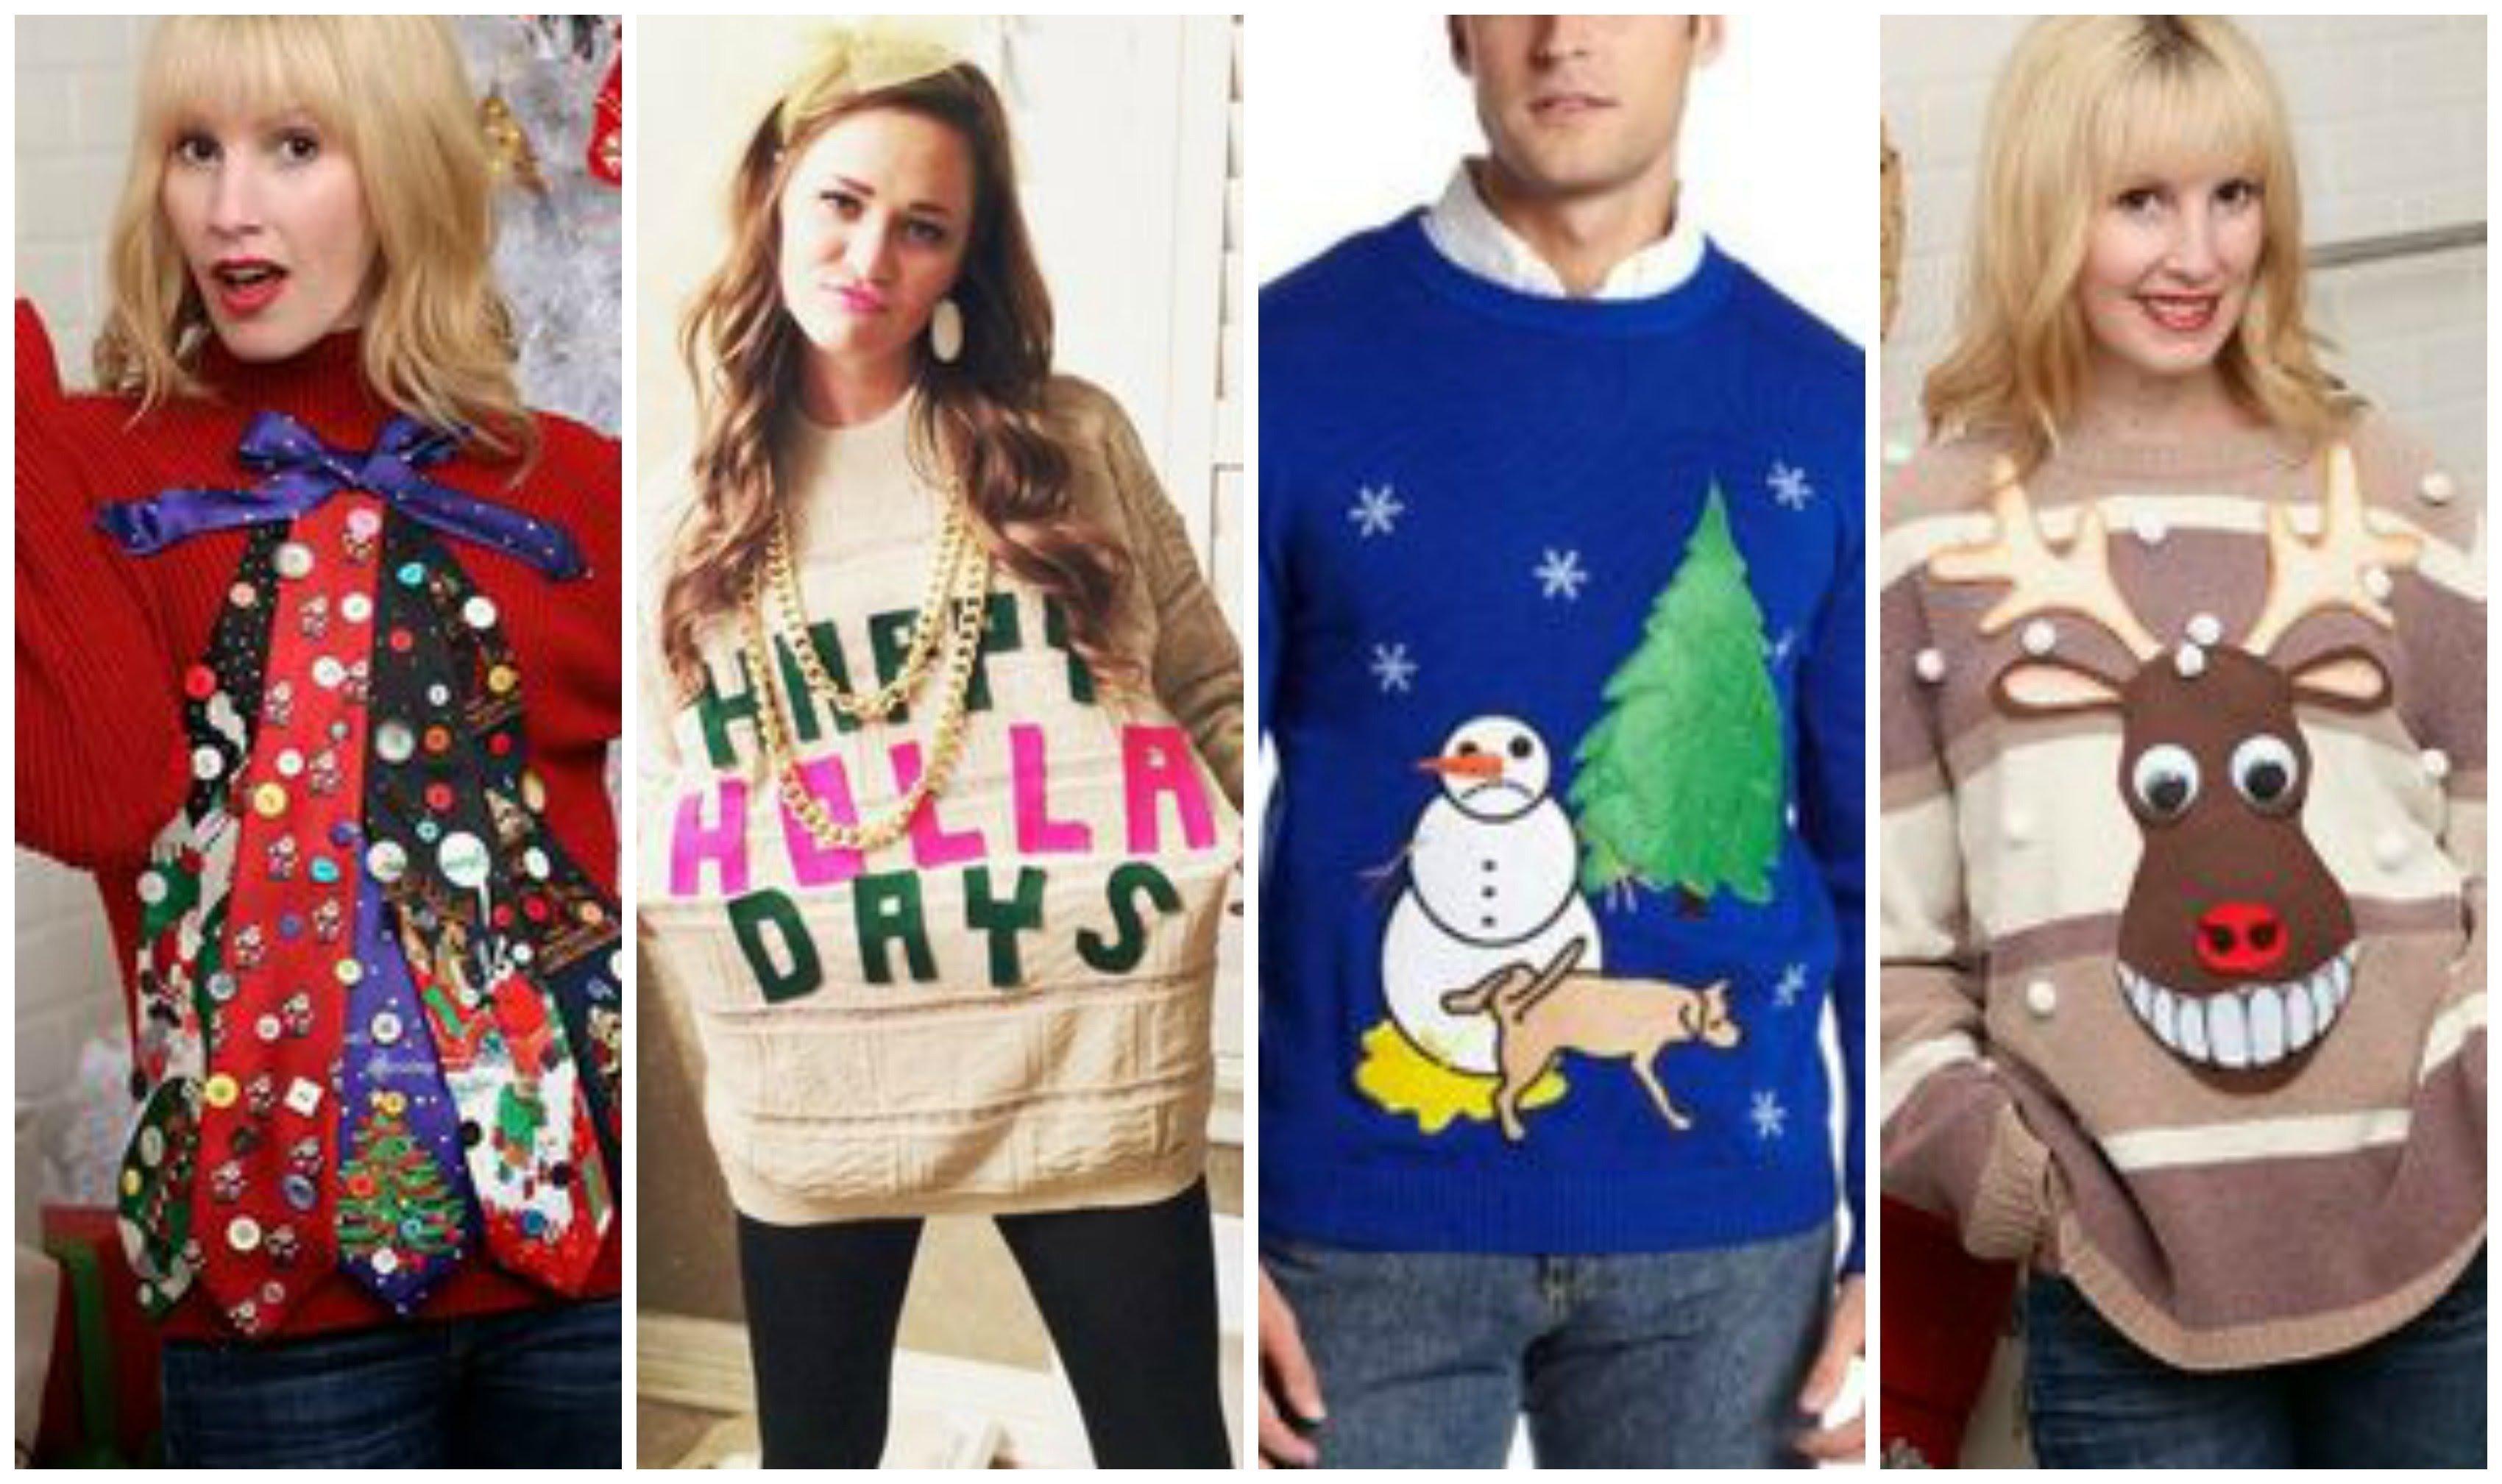 10 Stylish Ugly Christmas Sweaters Ideas Homemade ugly christmas sweater ideas lookbook youtube 1 2021